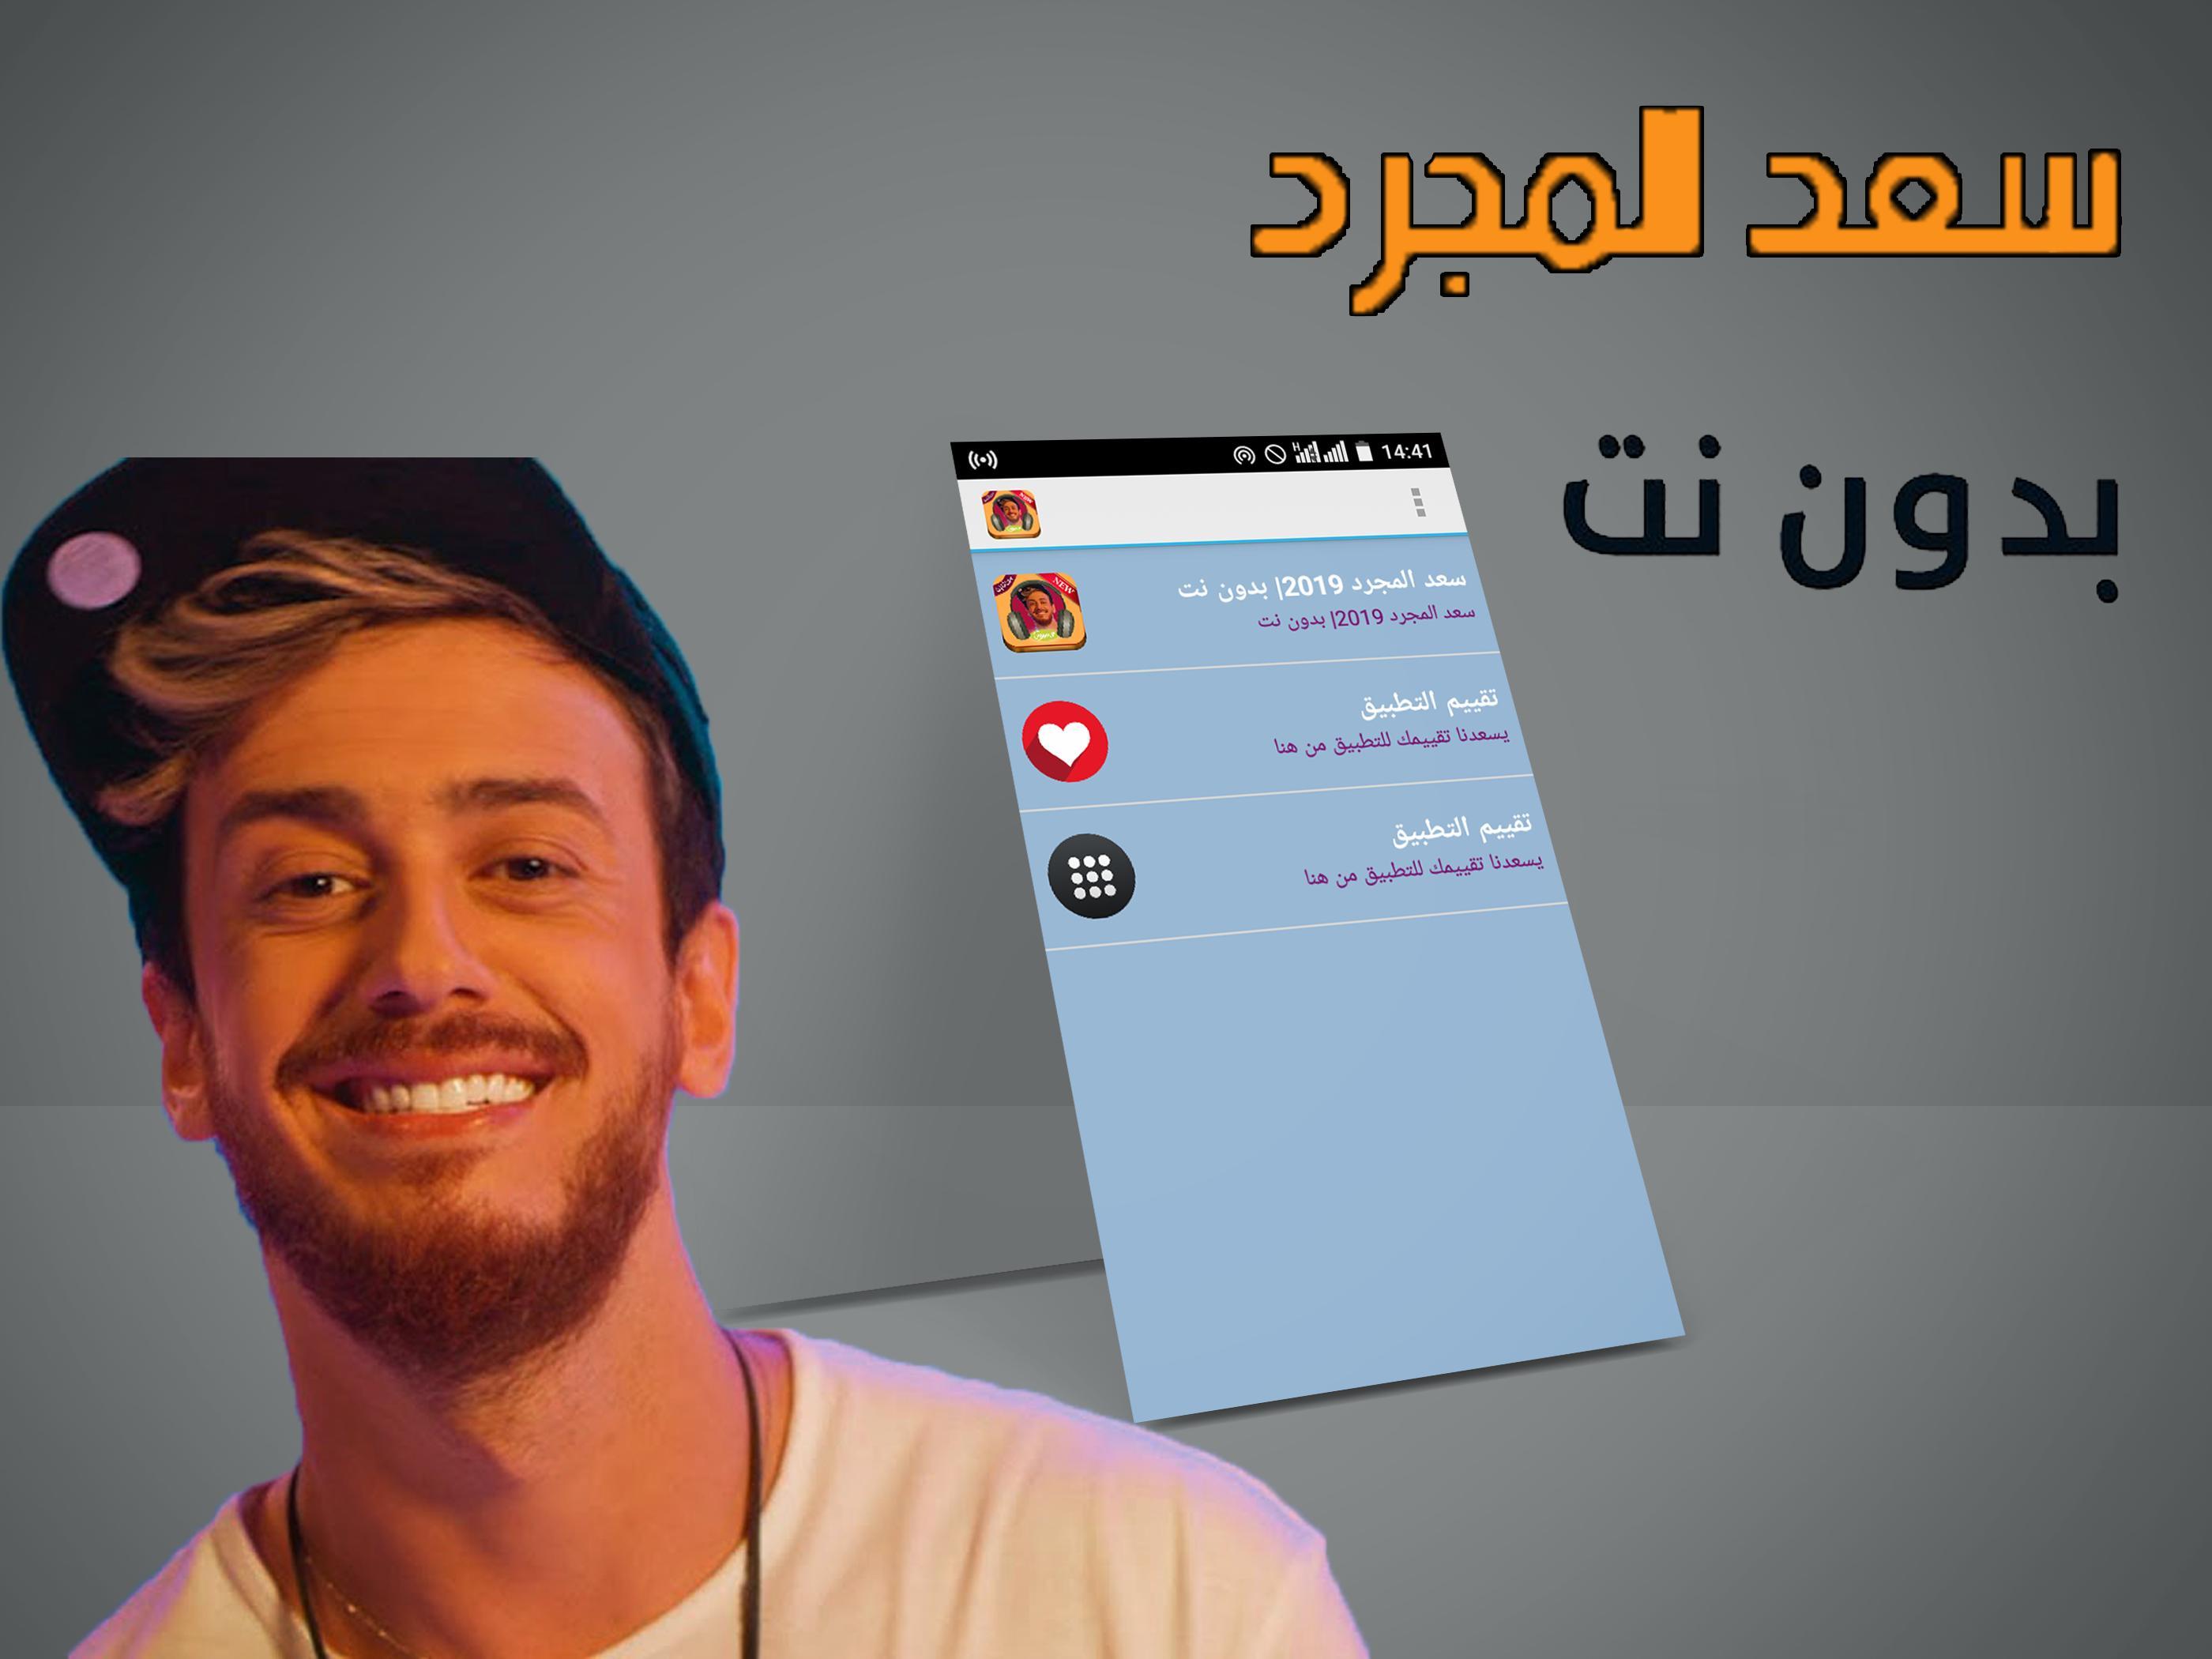 اغاني سعد المجرد بدون انترنت For Android Apk Download